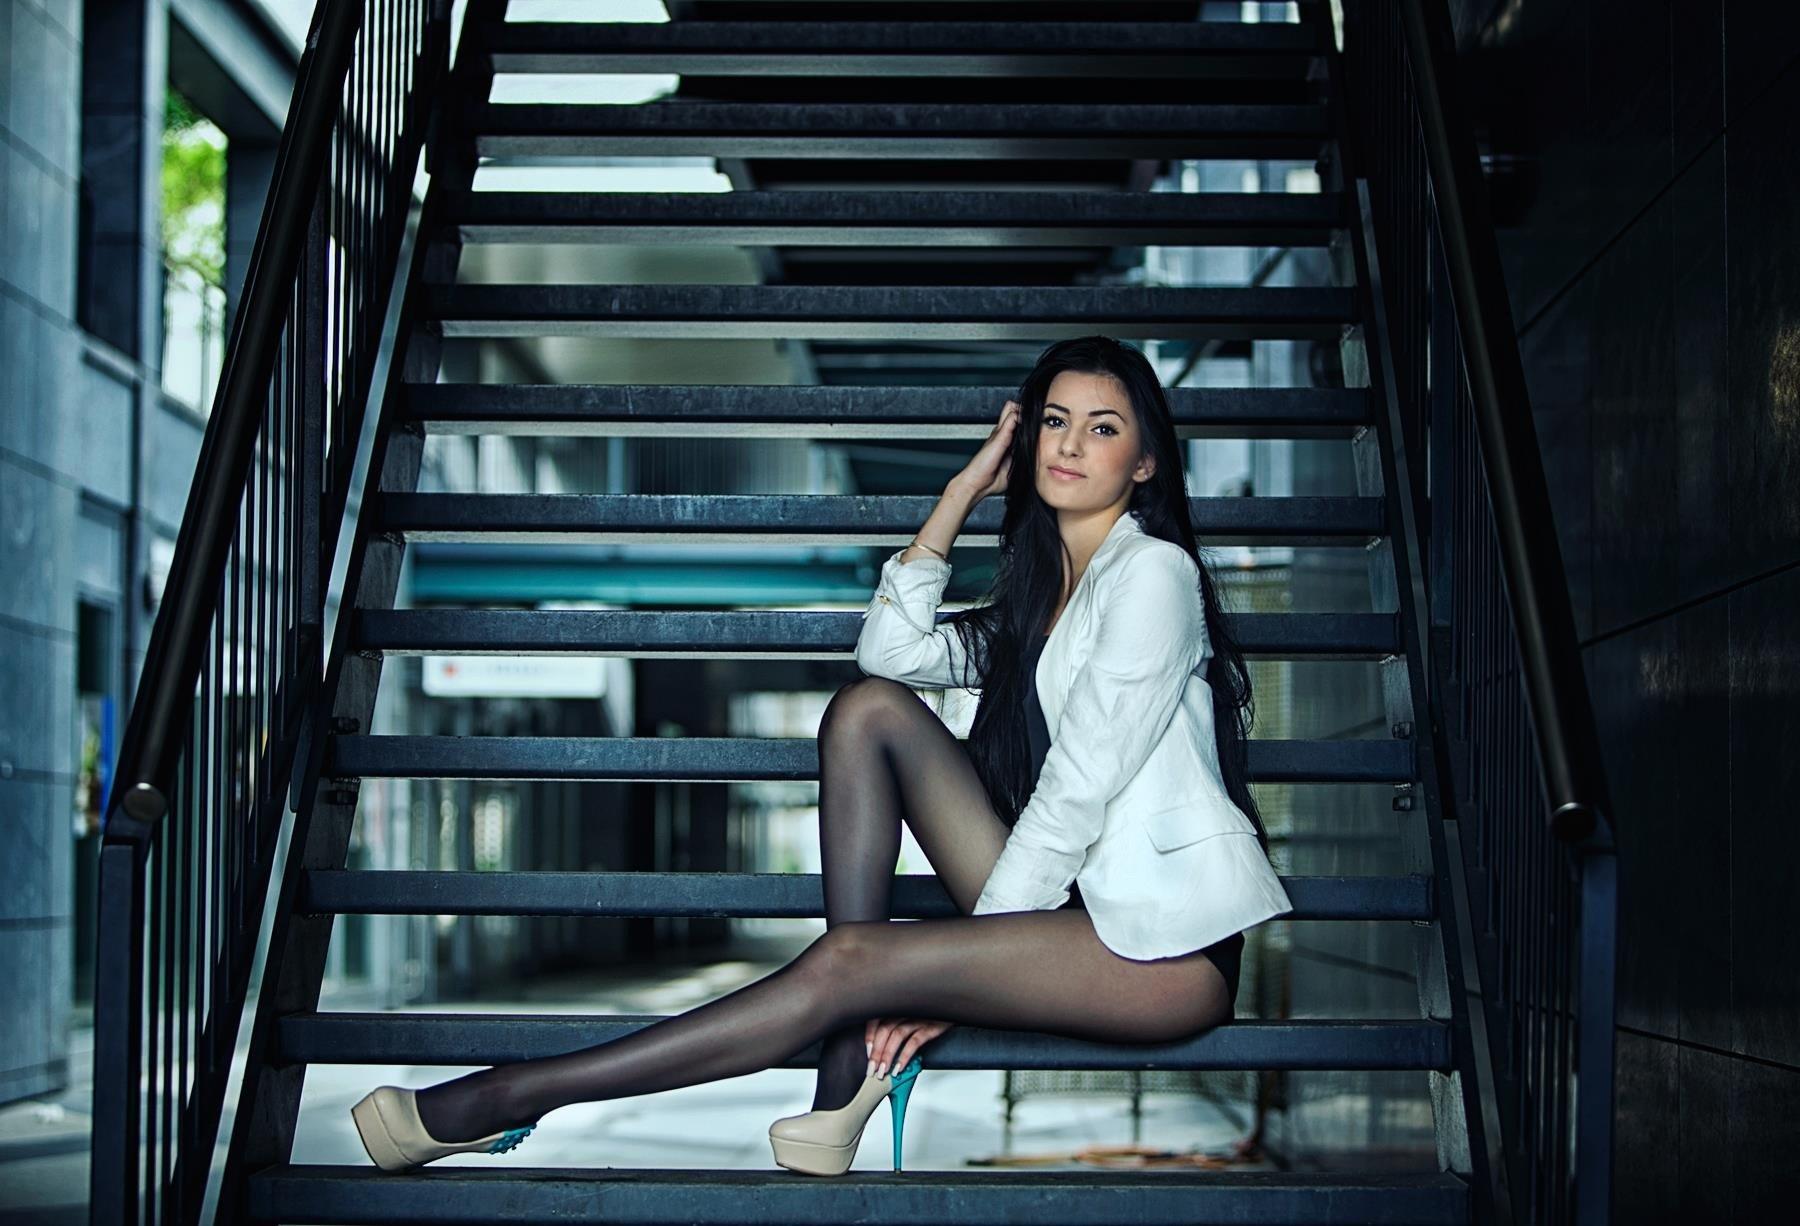 Super model tiffani thompson fingers her juicy pussy - 4 3